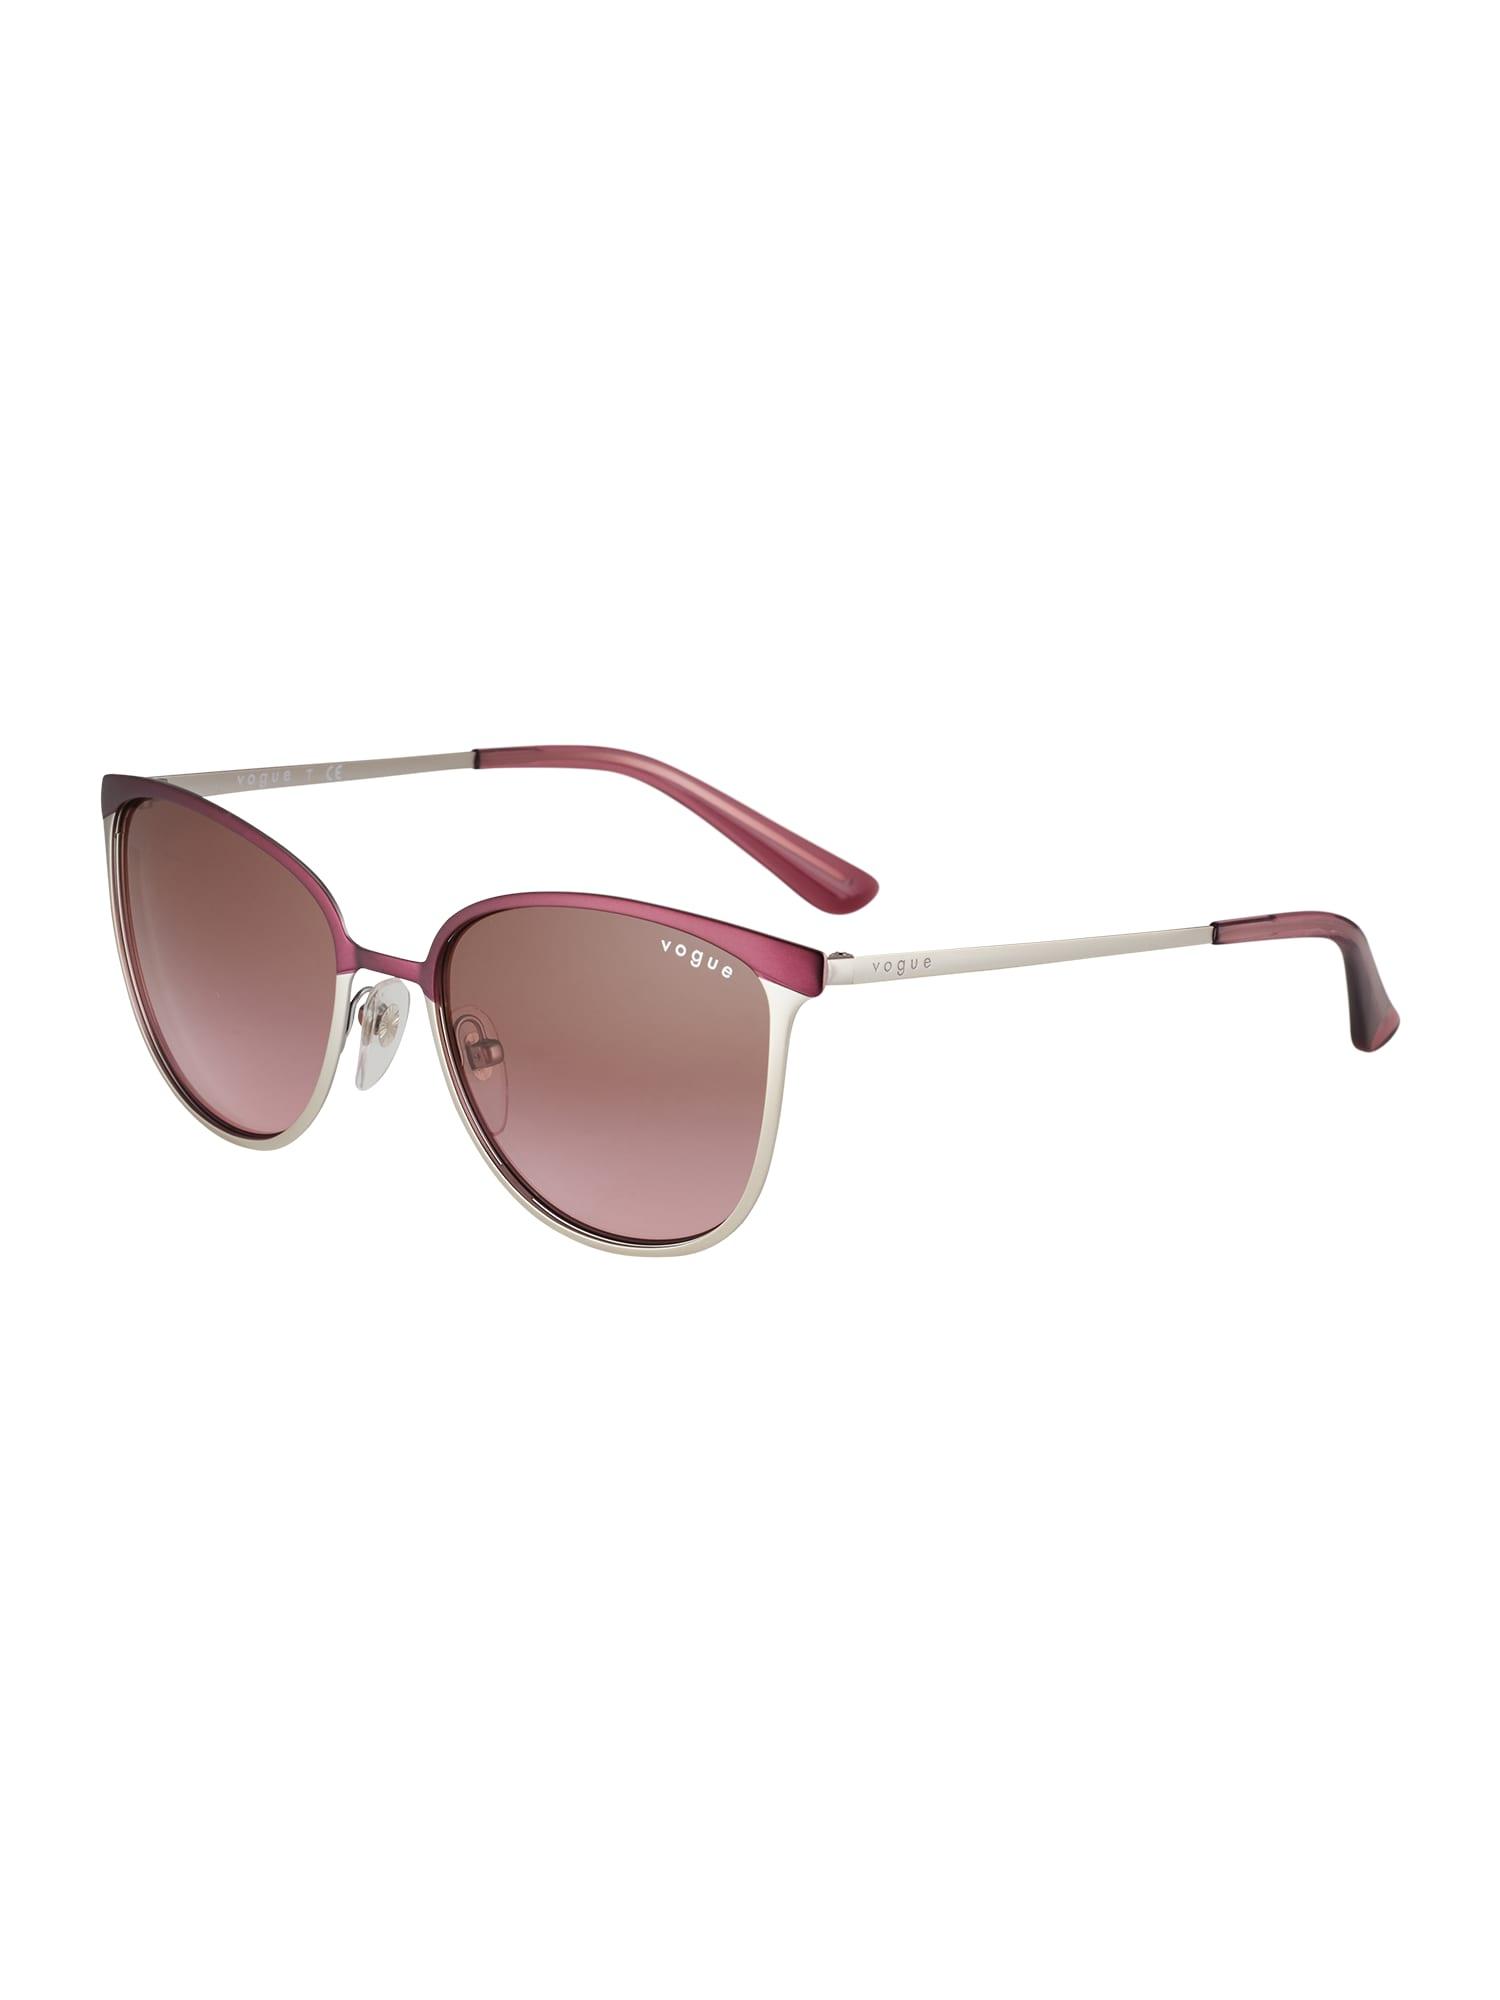 VOGUE Eyewear Slnečné okuliare  strieborná / fialová